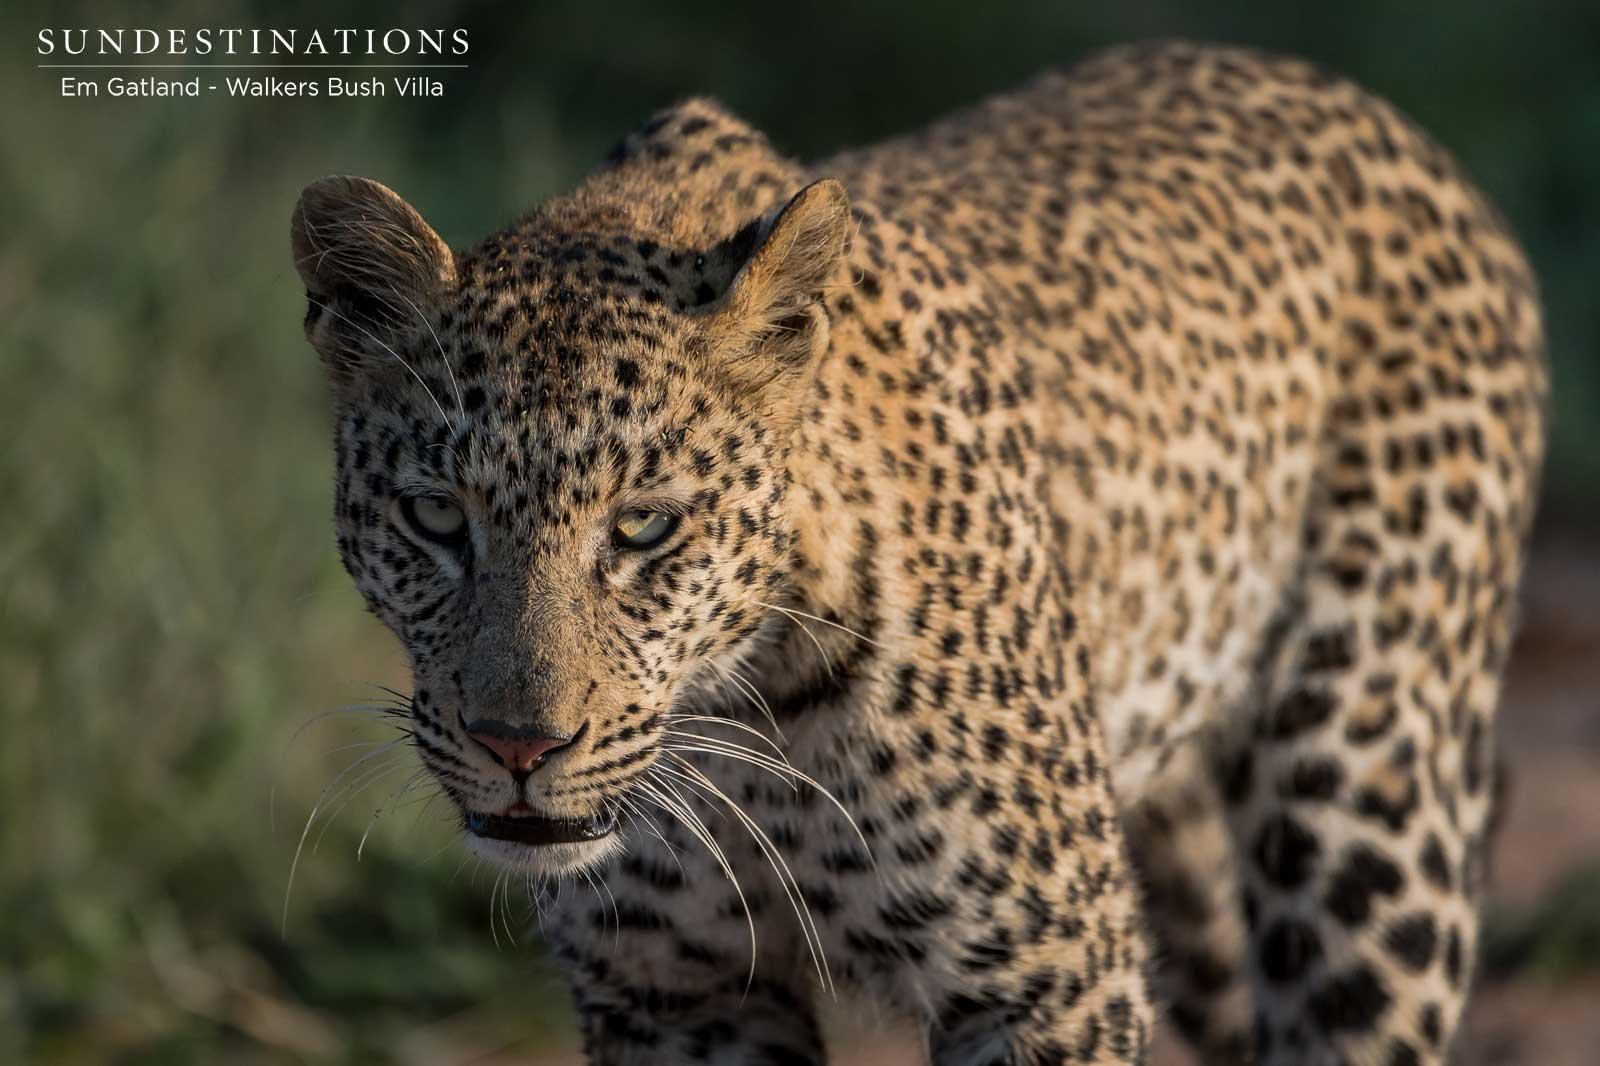 Leopards at Walkers Bush Villa